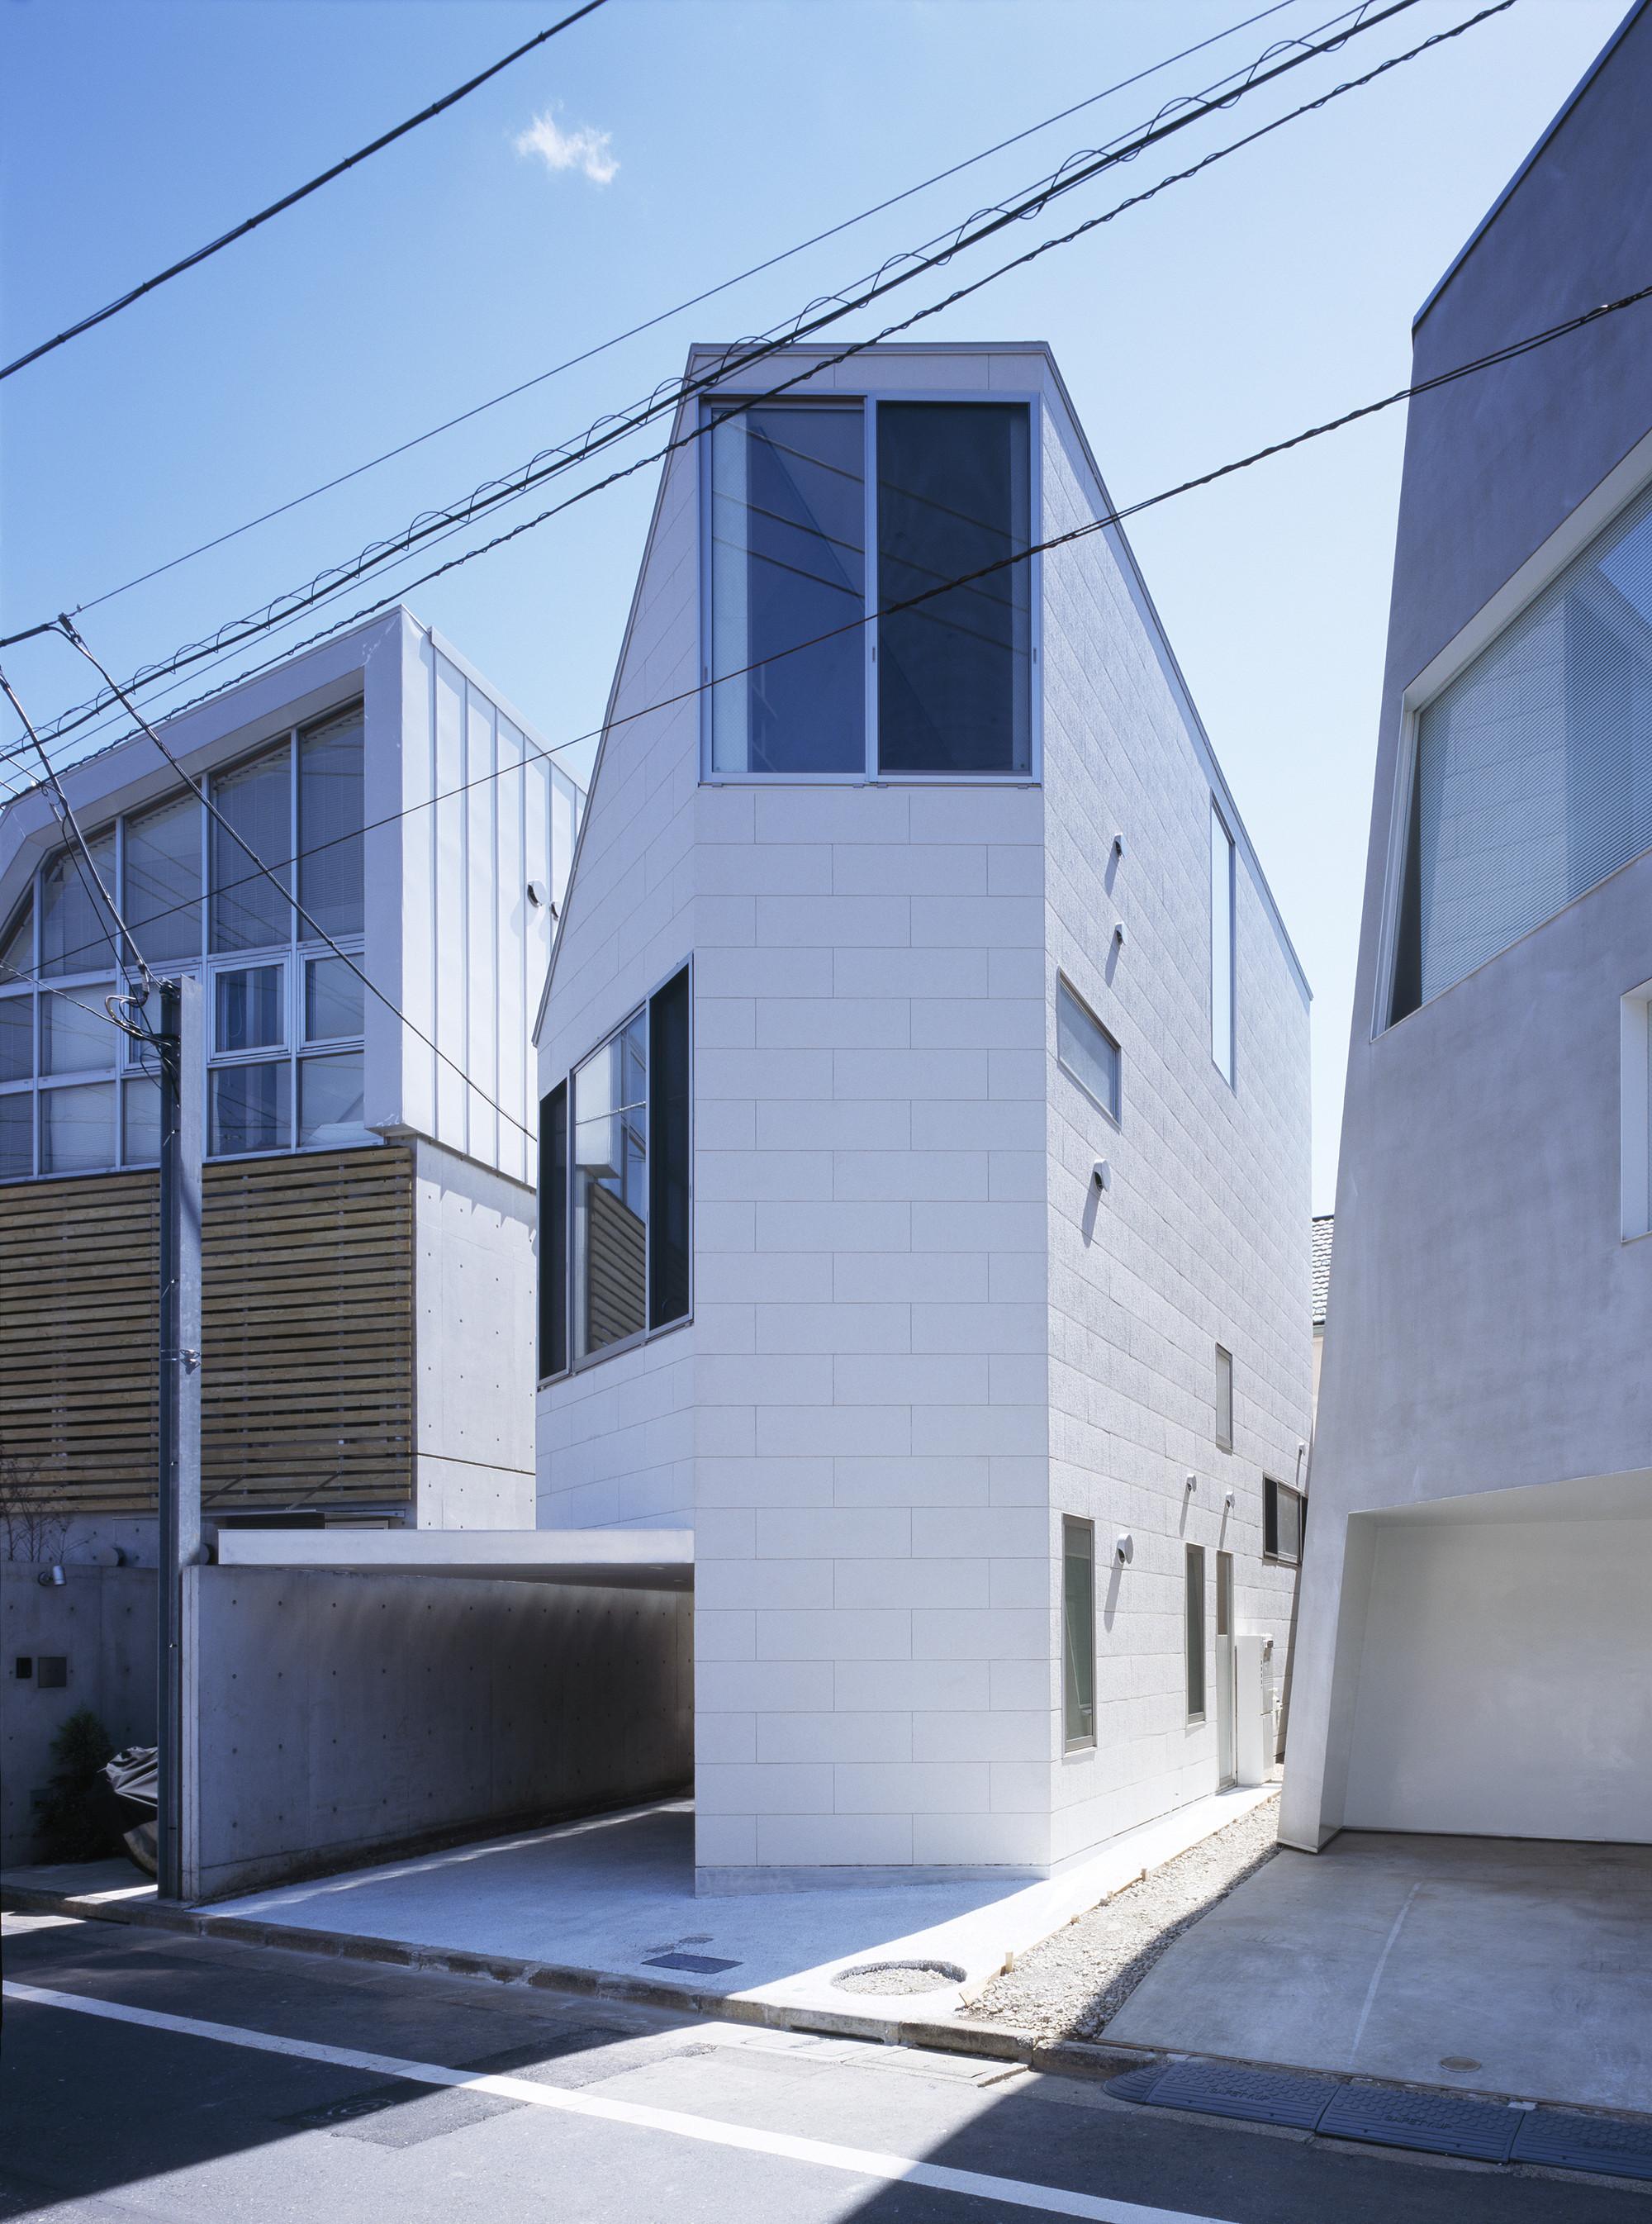 Gallery of matsubara house hiroyuki ito o f d 9 - Takanawa house by o f d hiroyuki ito ...